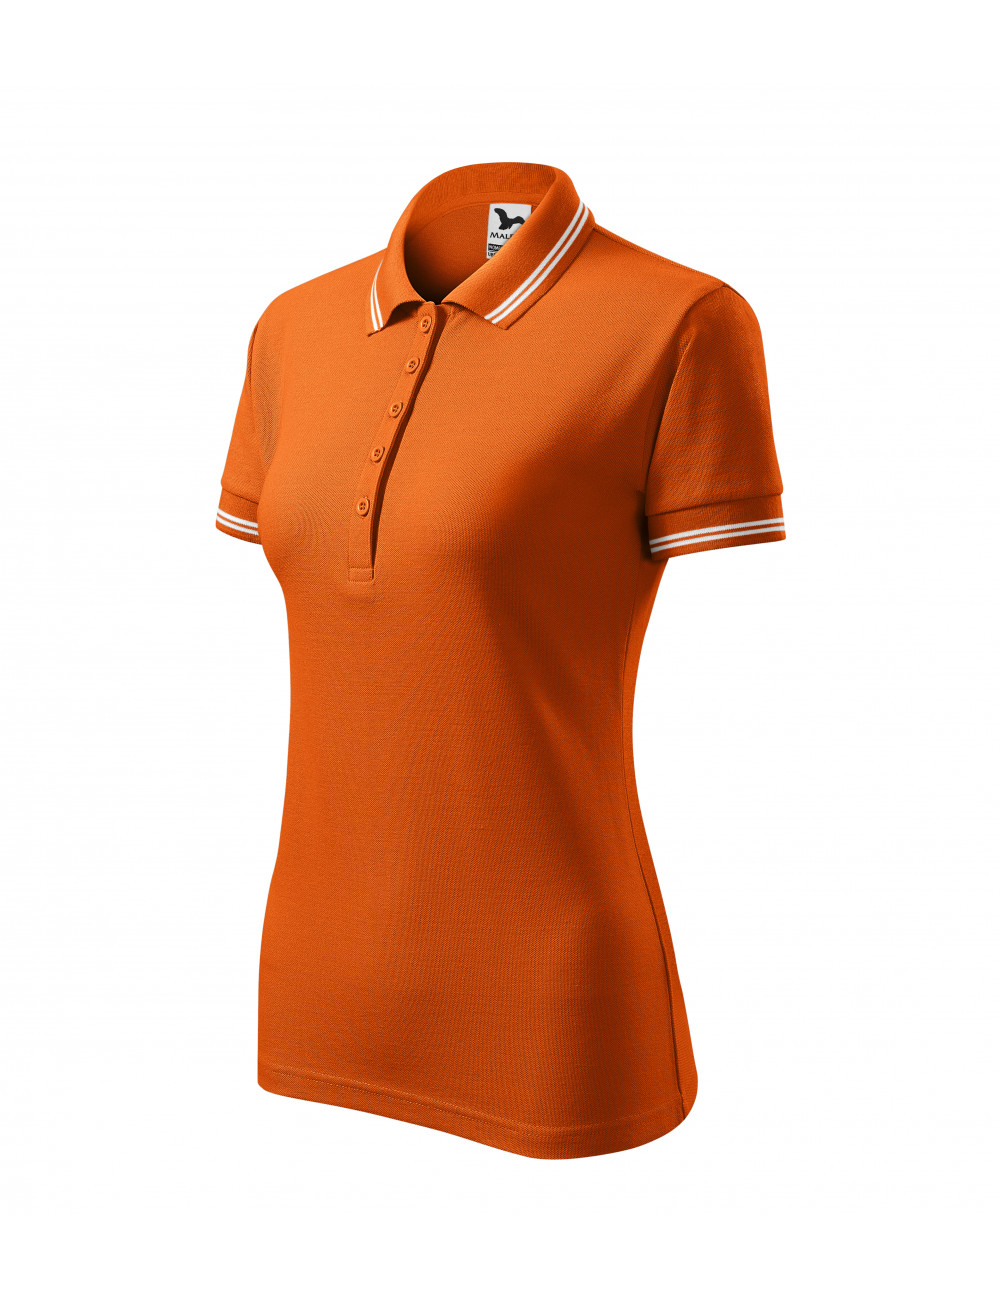 Adler MALFINI Koszulka polo damska Urban 220 pomarańczowy